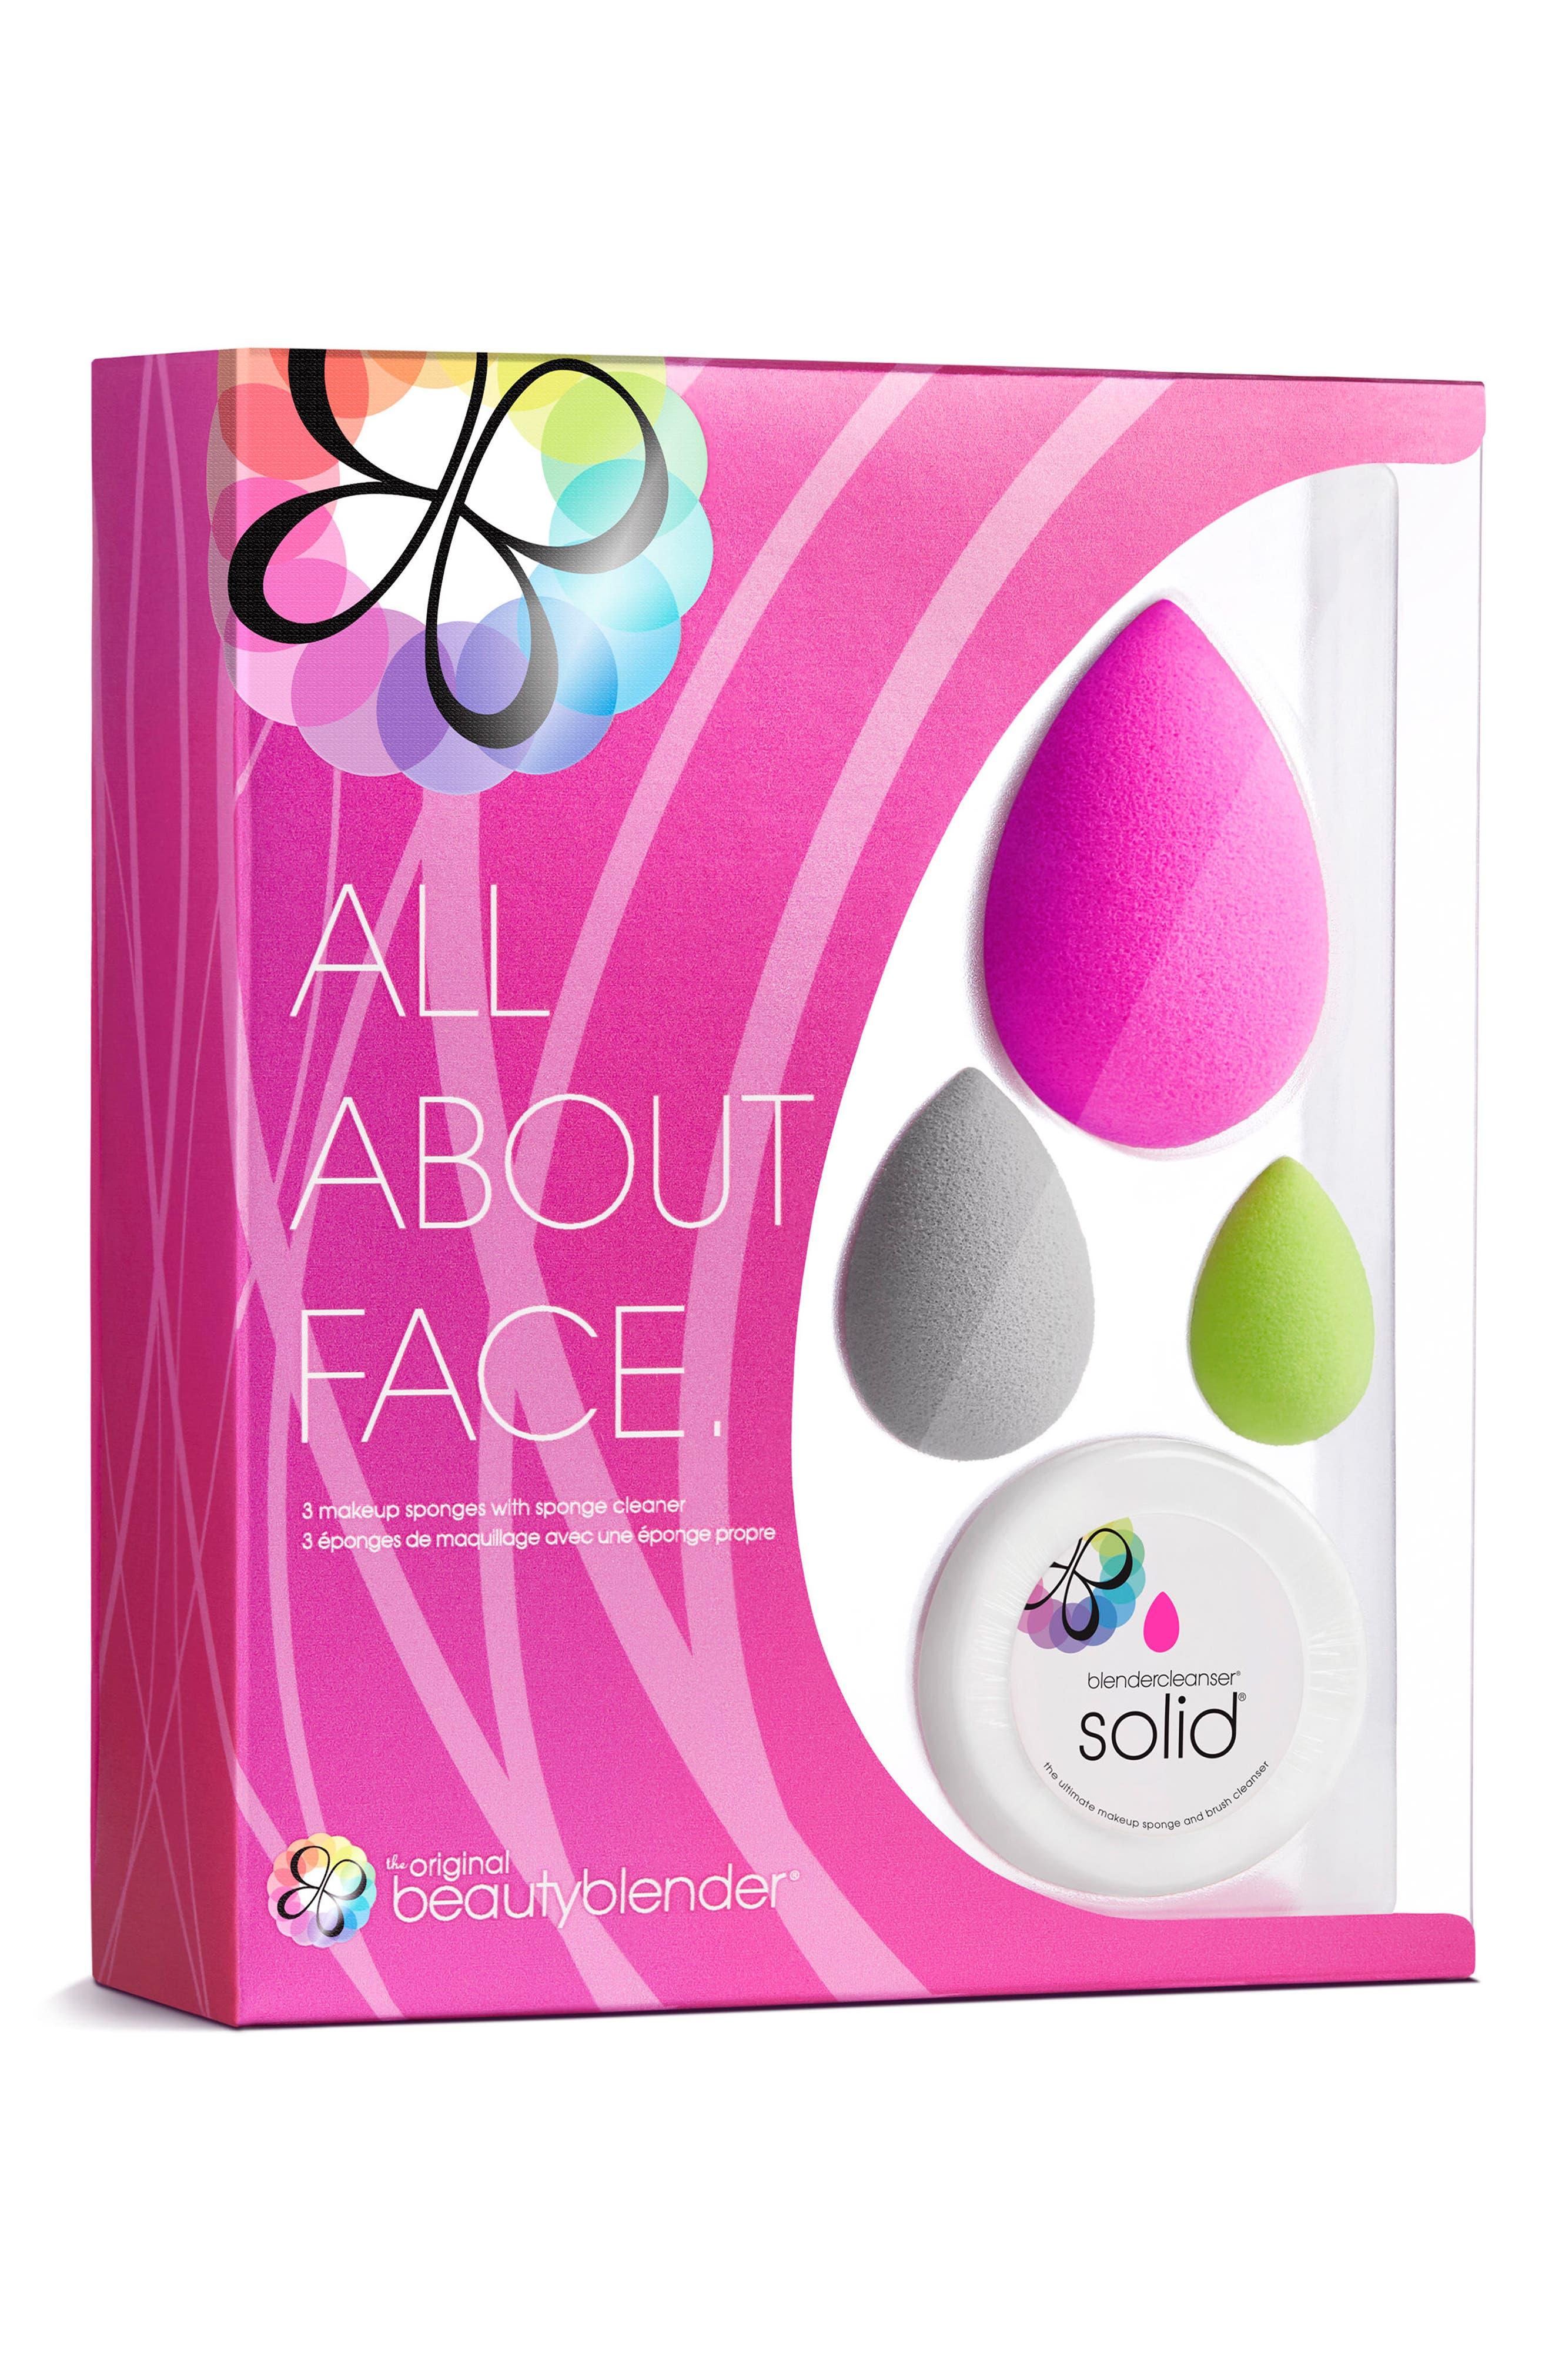 All.About.Face Set,                             Main thumbnail 1, color,                             No Color